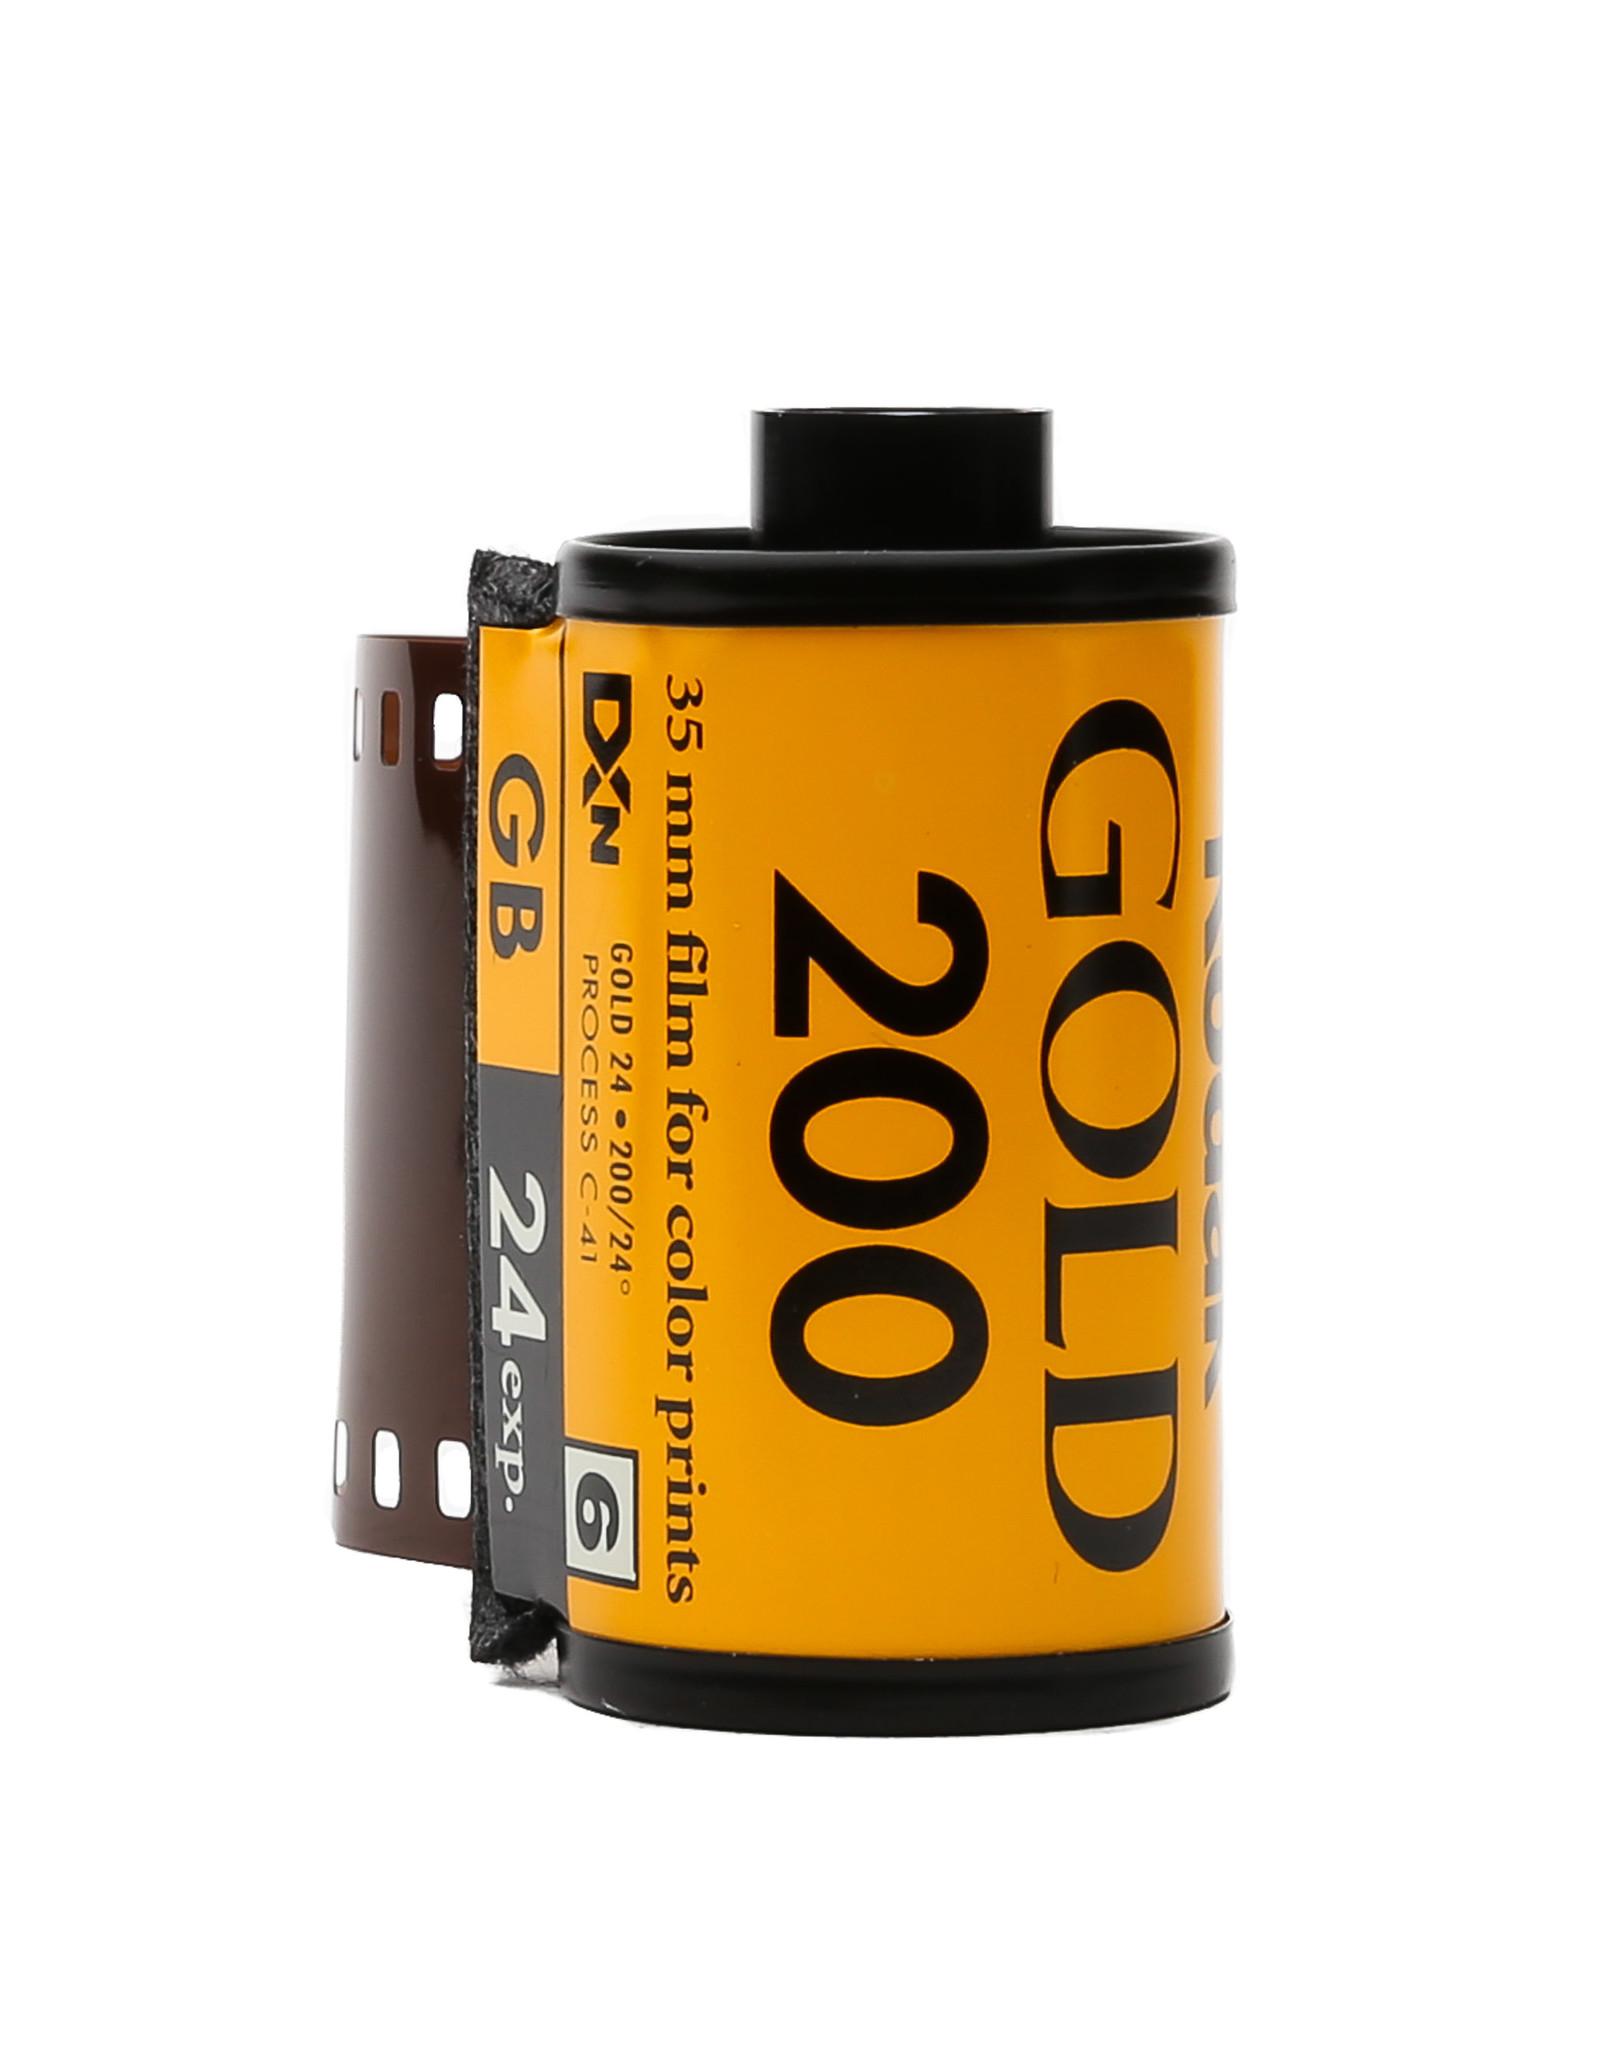 kodak Kodak Gold 200 24 exp. Expired Film